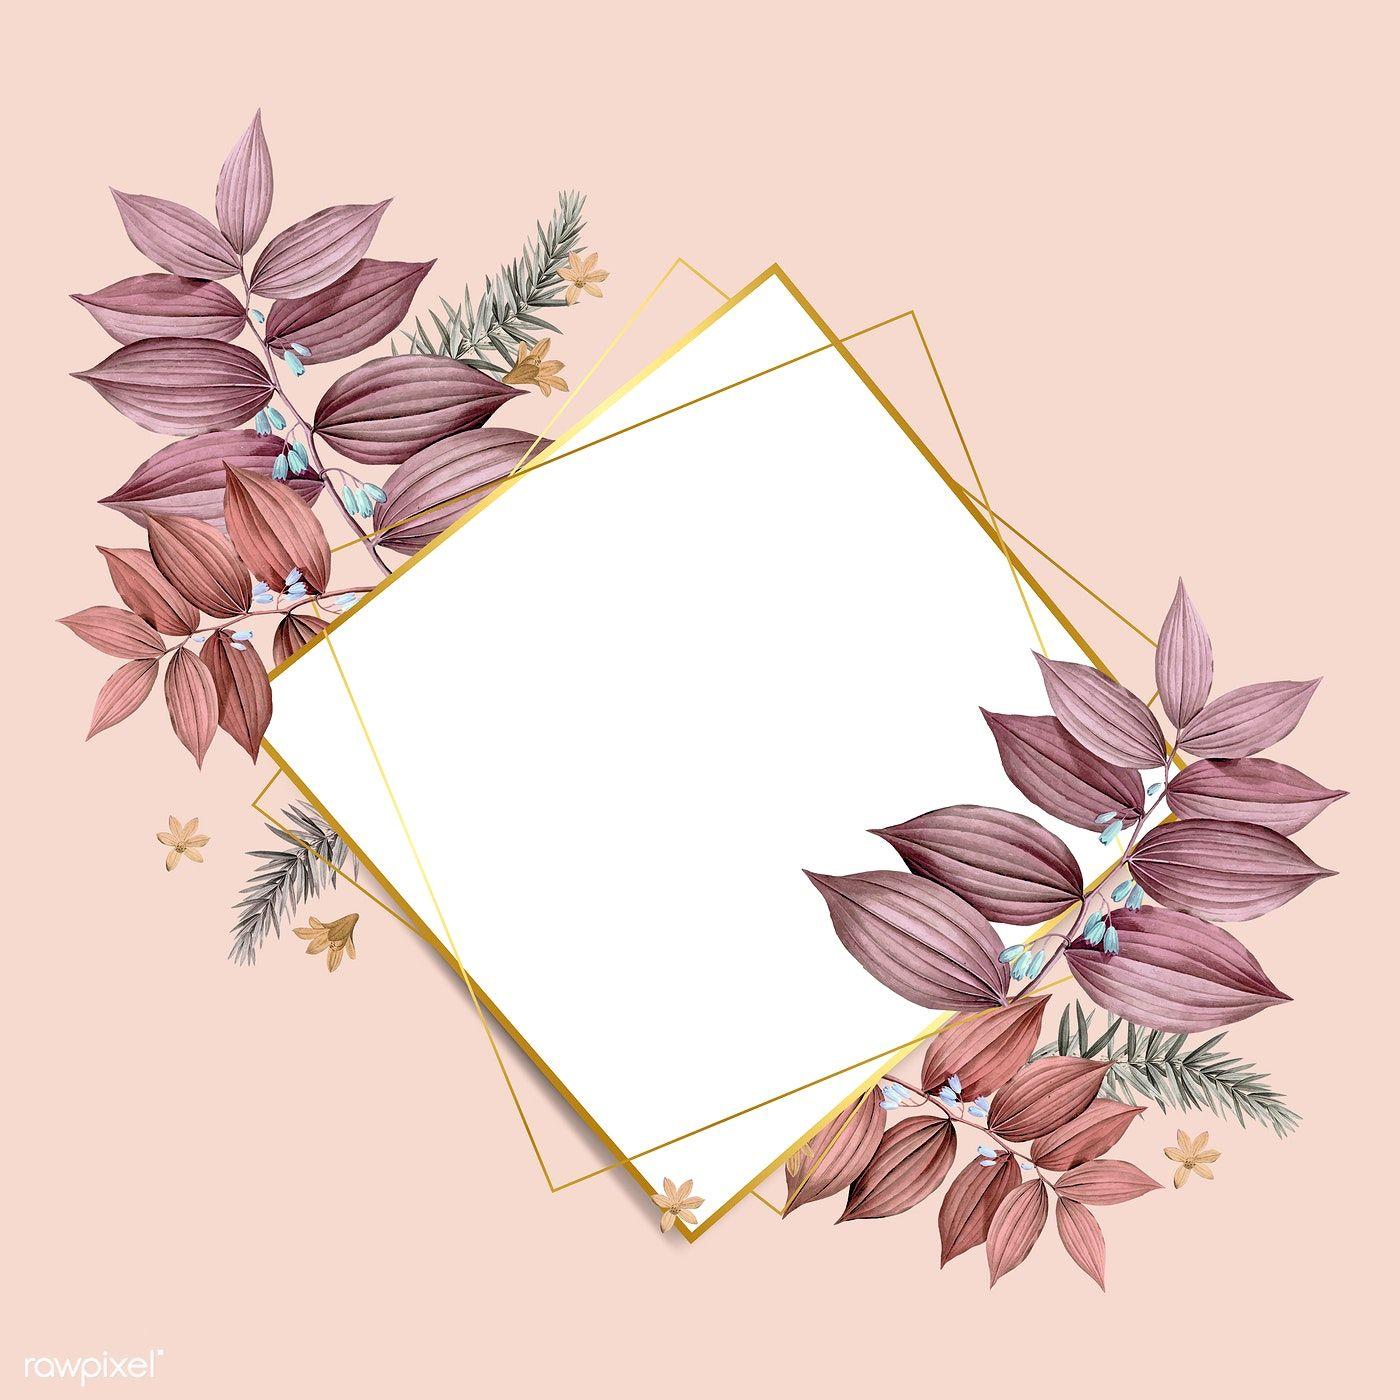 Download premium vector of Rhombus foliage frame on pastel peach 1400x1400